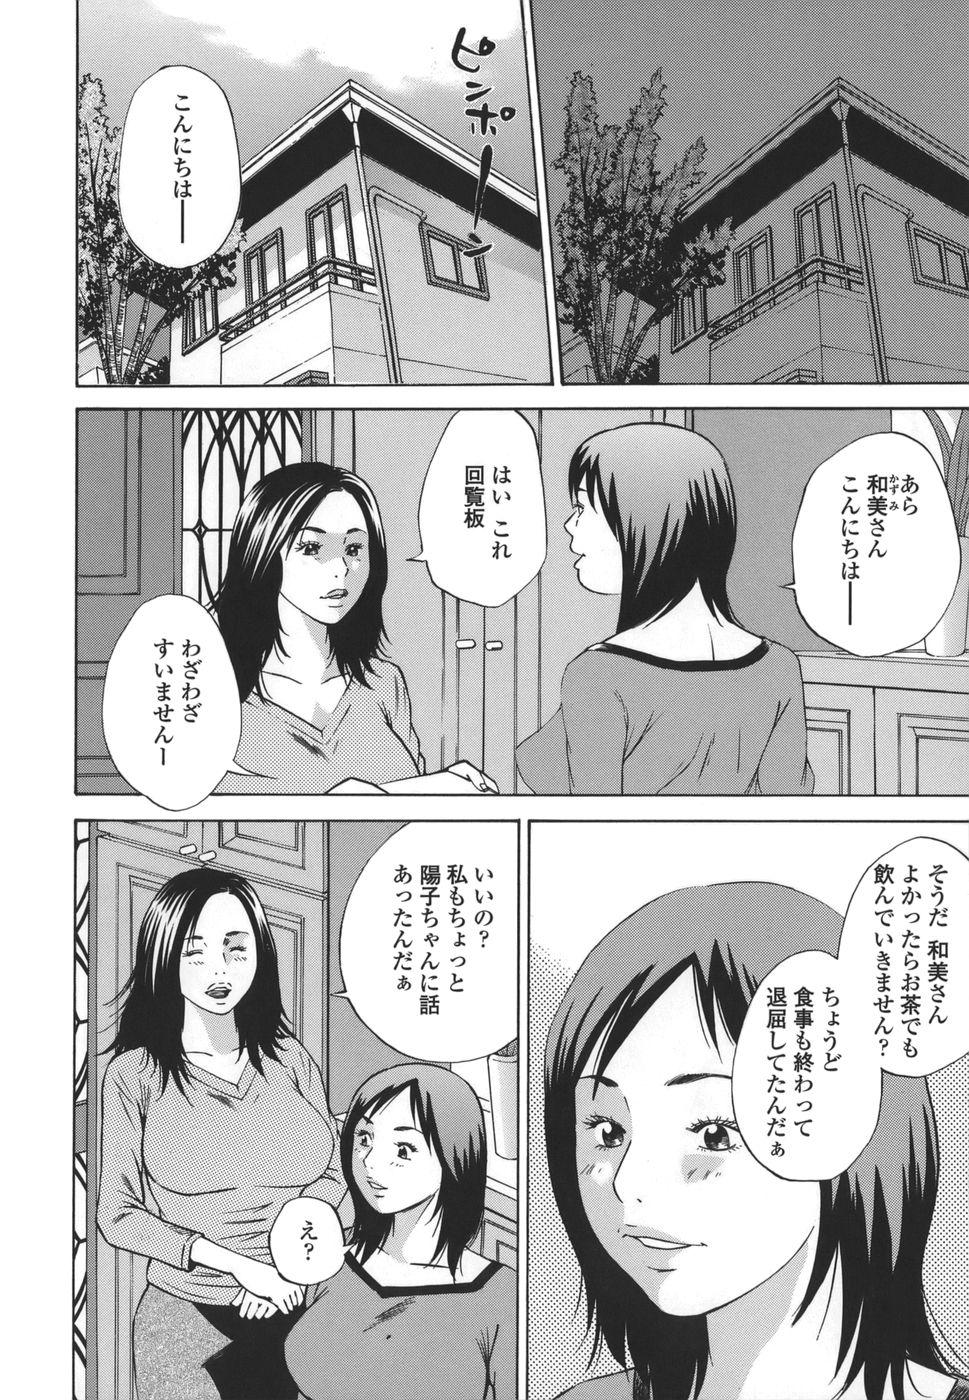 Kinshin Goukan - Near Relation Rapes 69